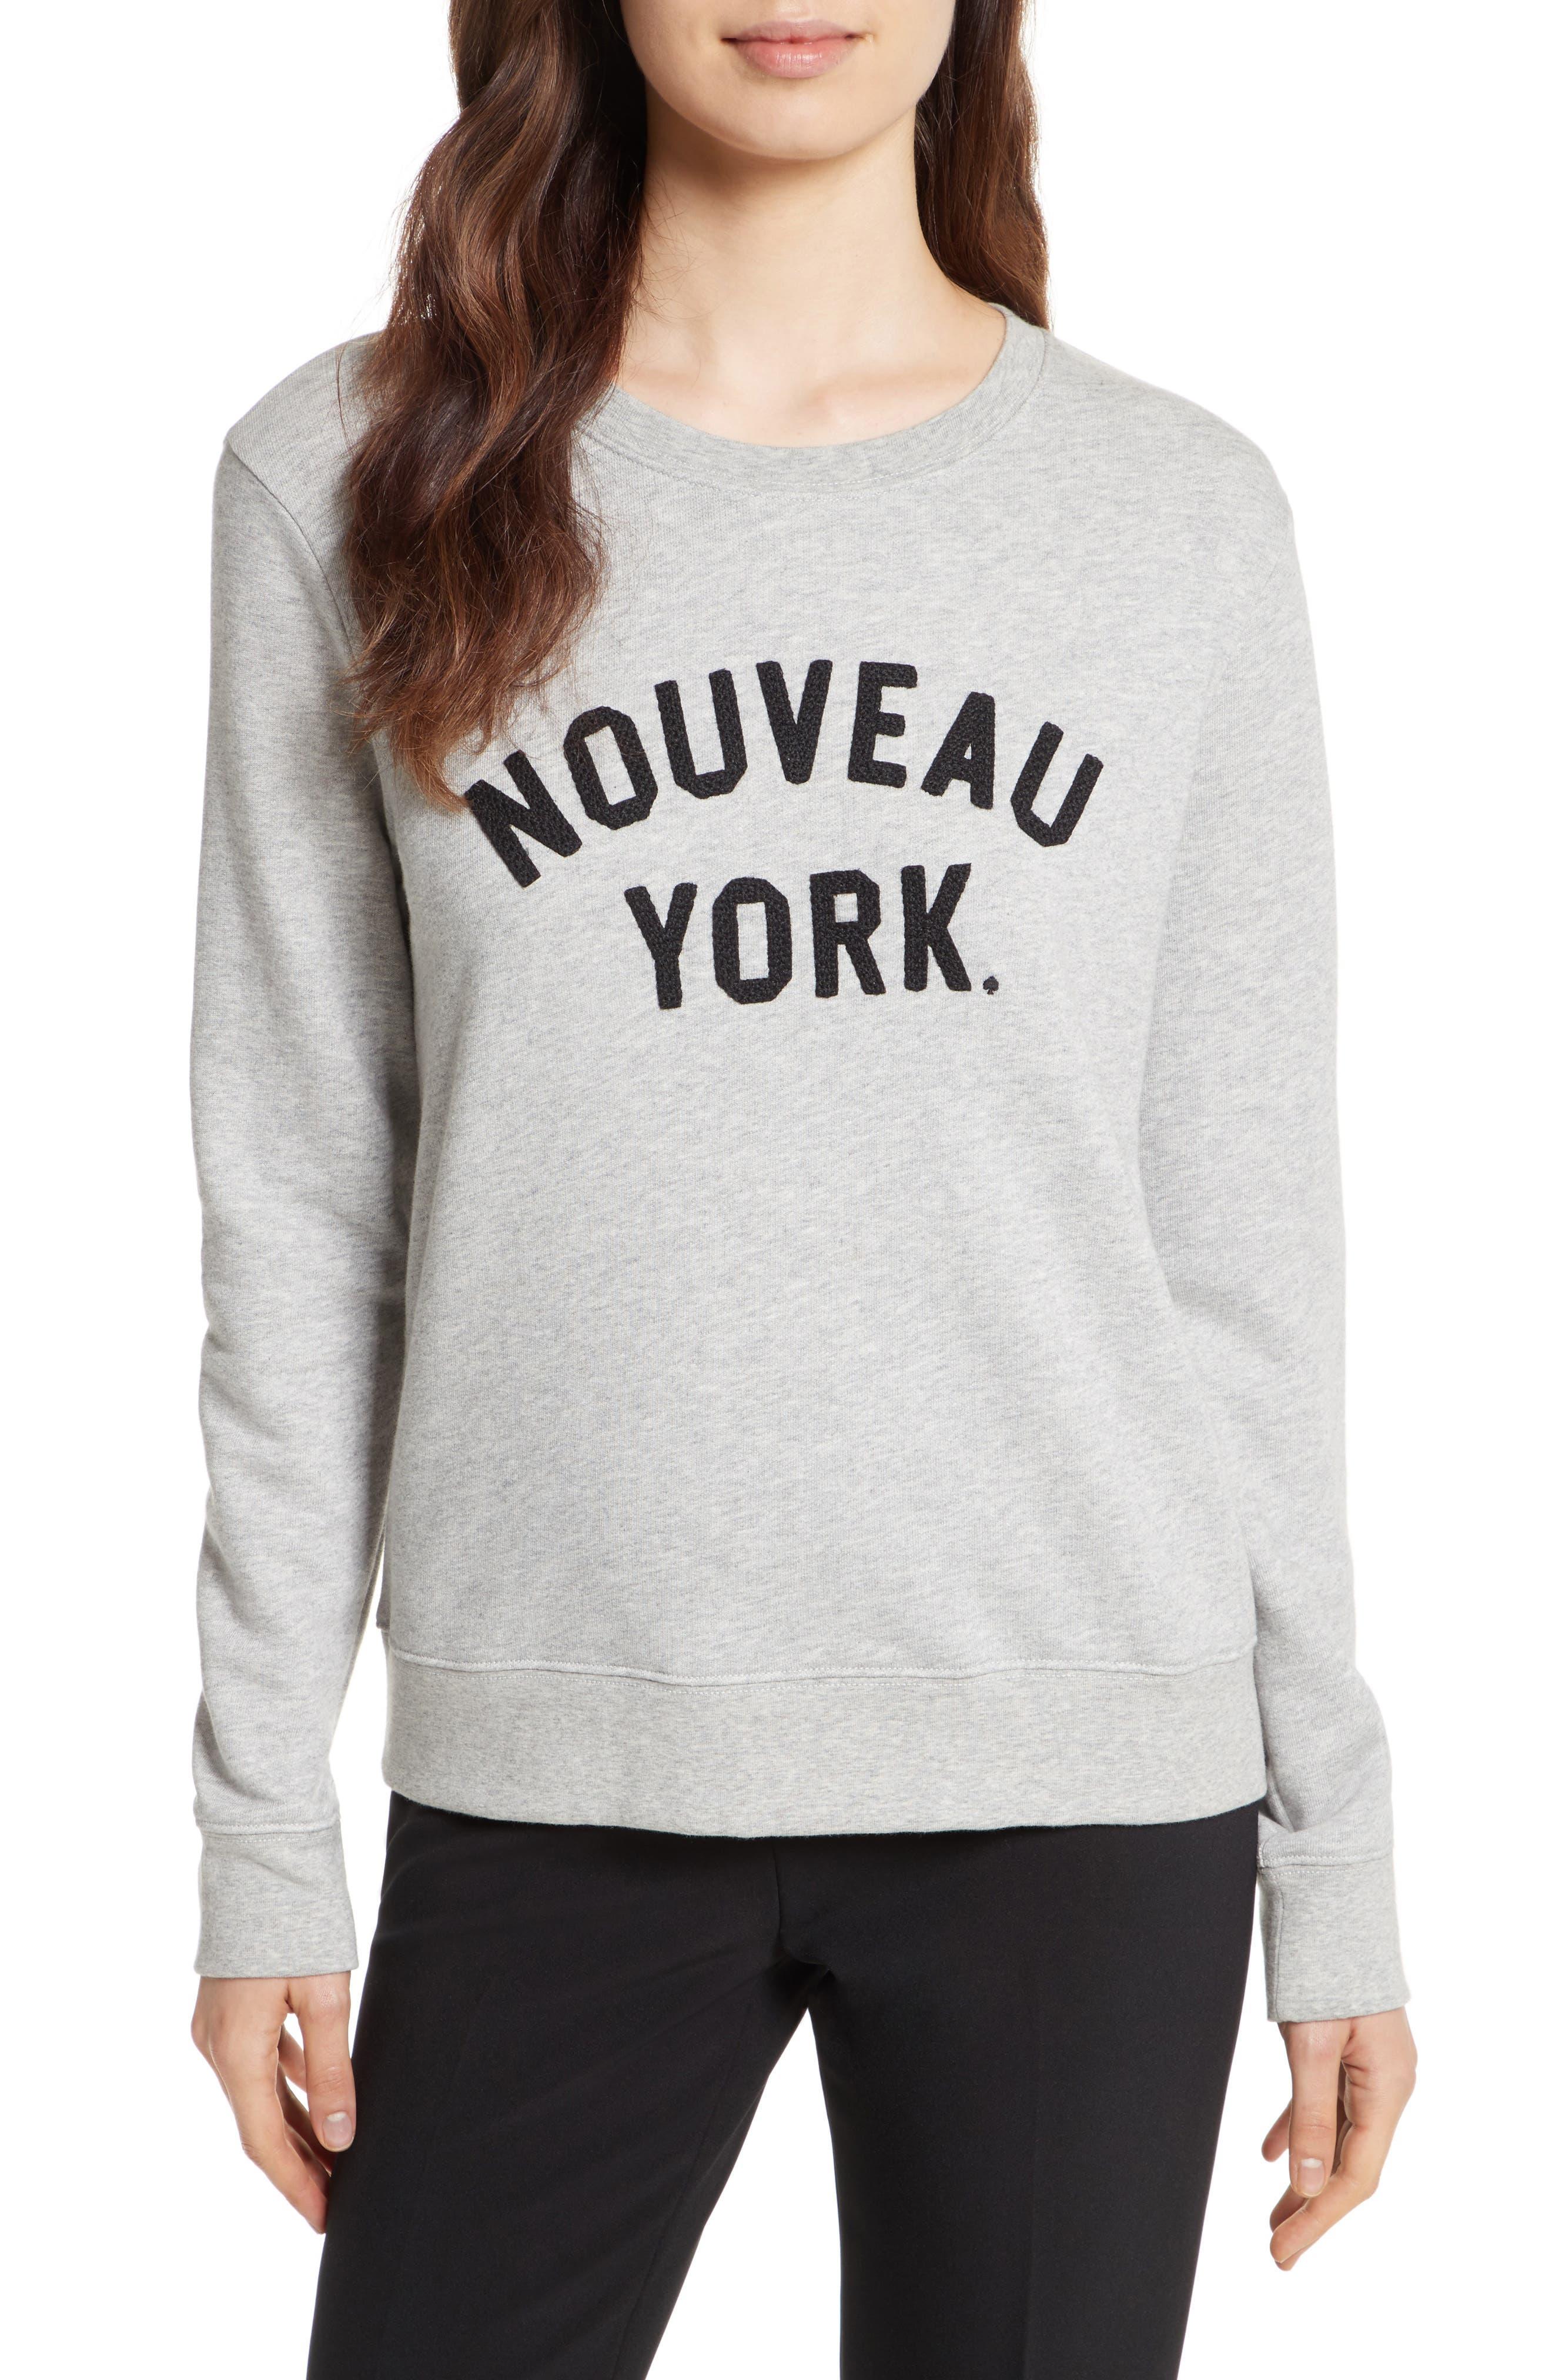 nouveau york sweatshirt,                             Main thumbnail 1, color,                             098